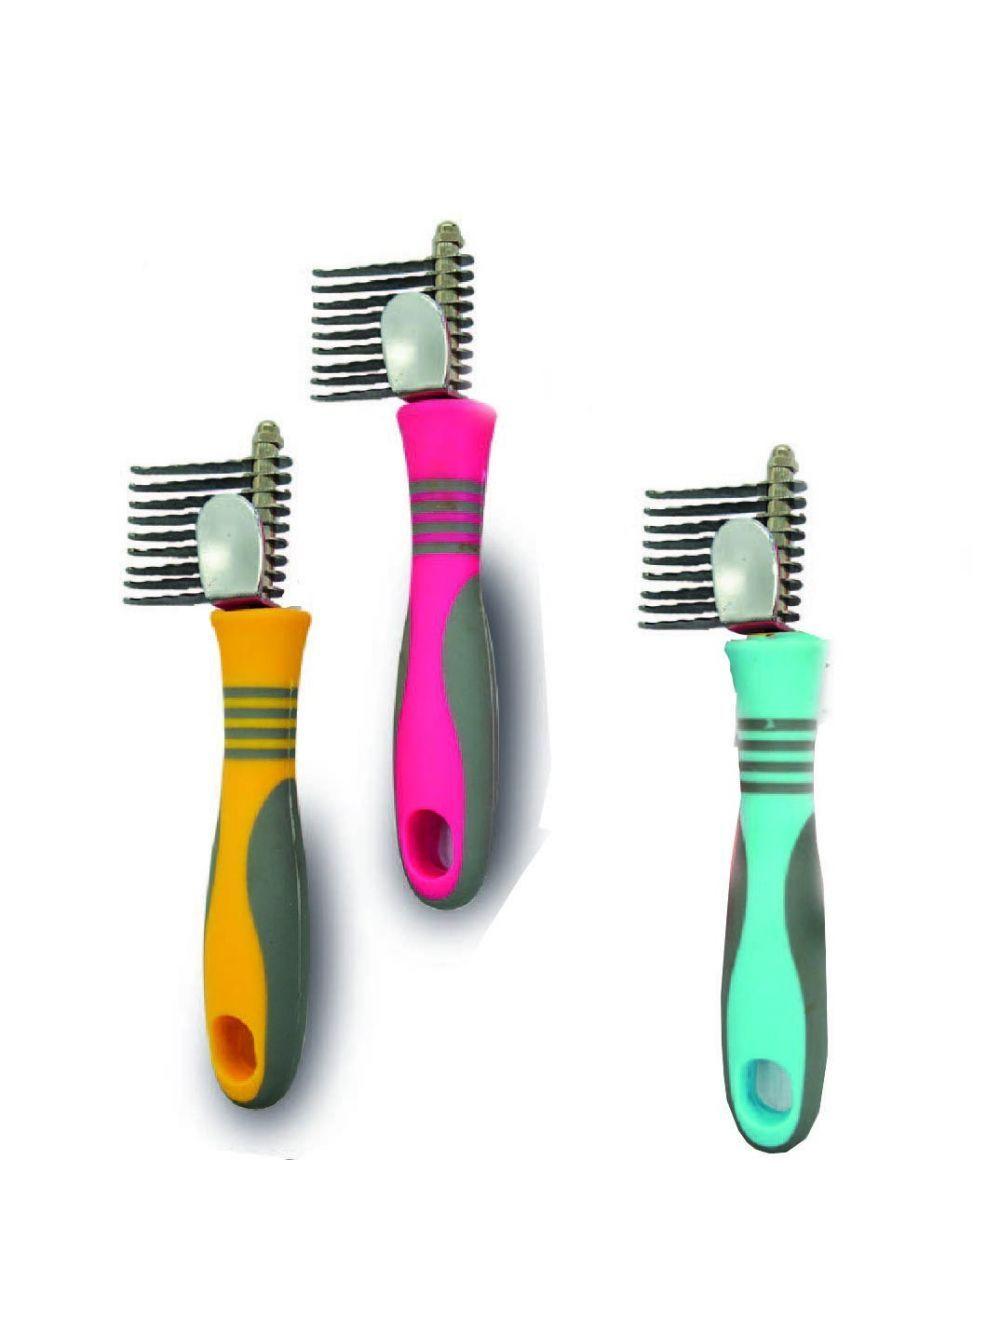 Cepillo desenredante para perros y gatos